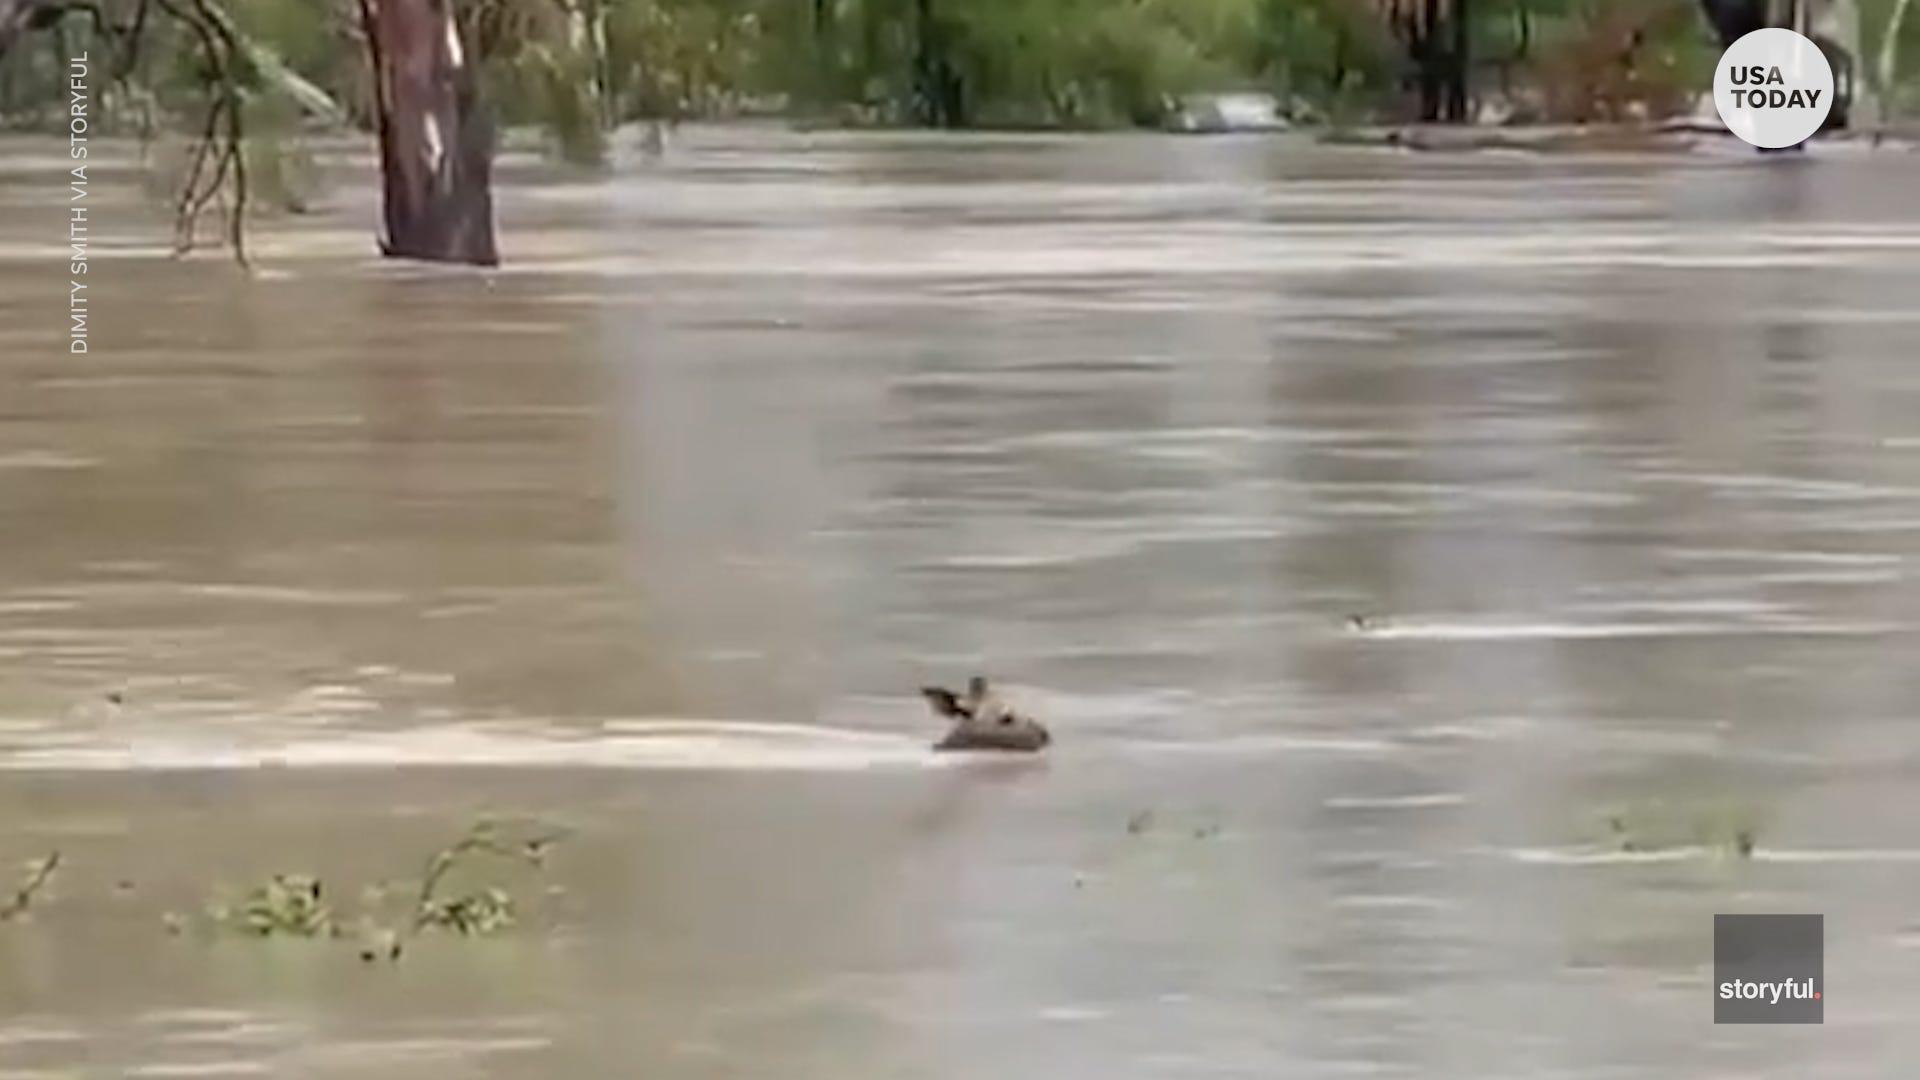 This kangaroo was spotted swimming through treacherous flood waters in Australia